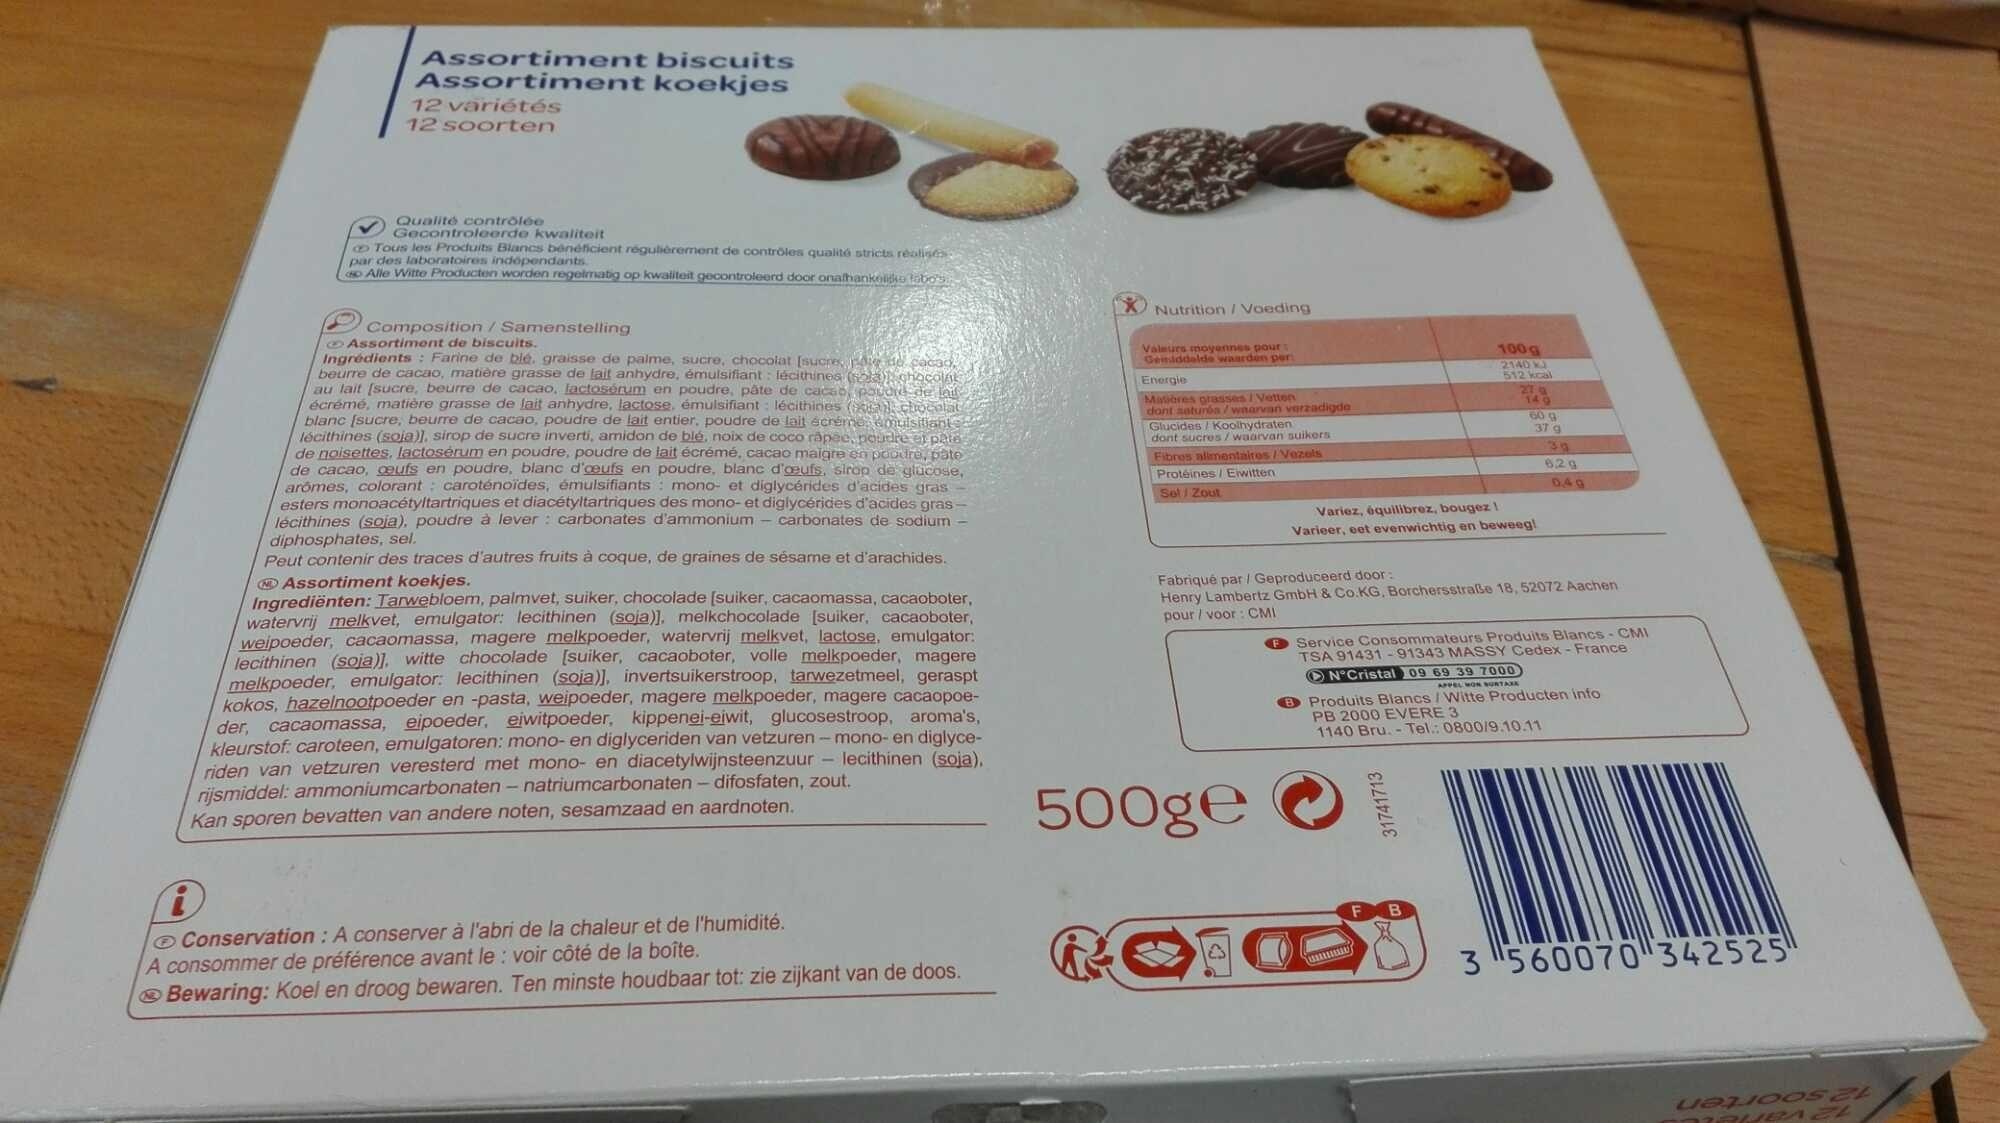 Assortiment de biscuits - Producto